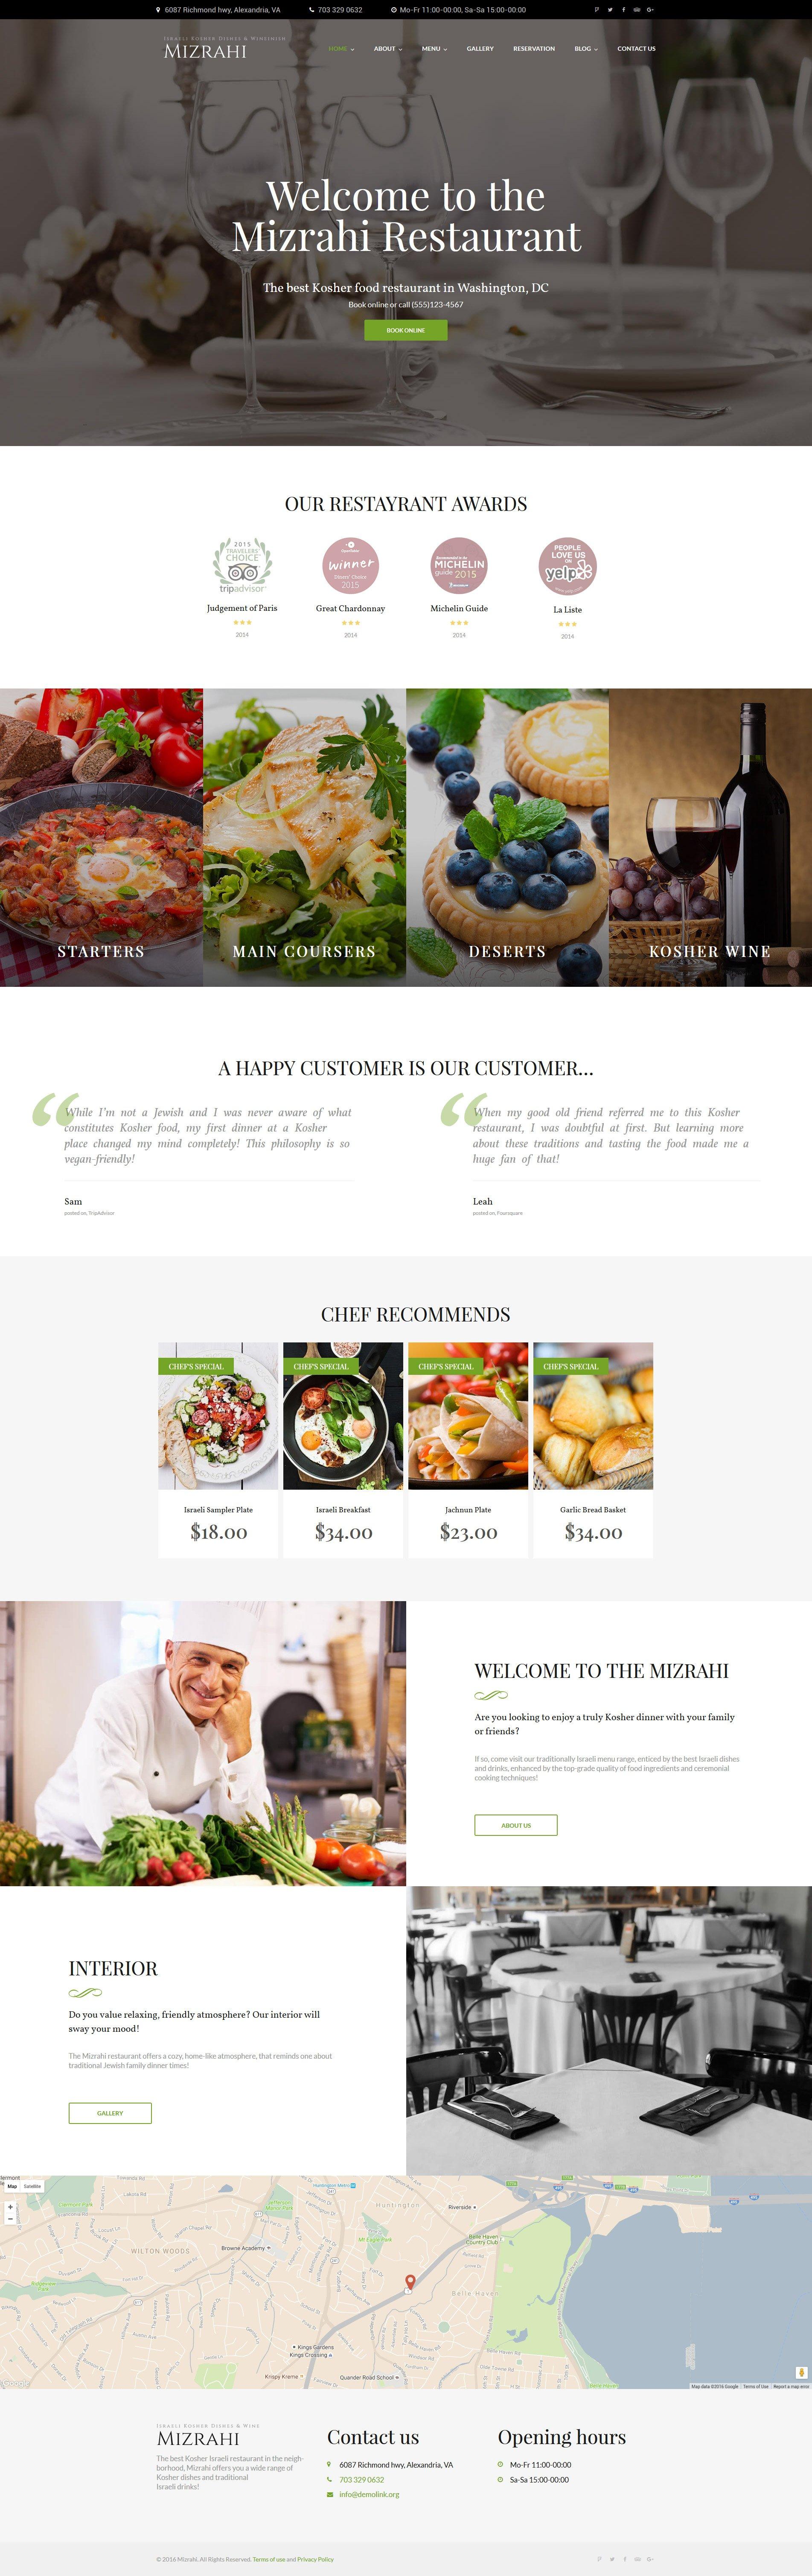 Mizrahi - Kosher Restaurant WordPress Theme